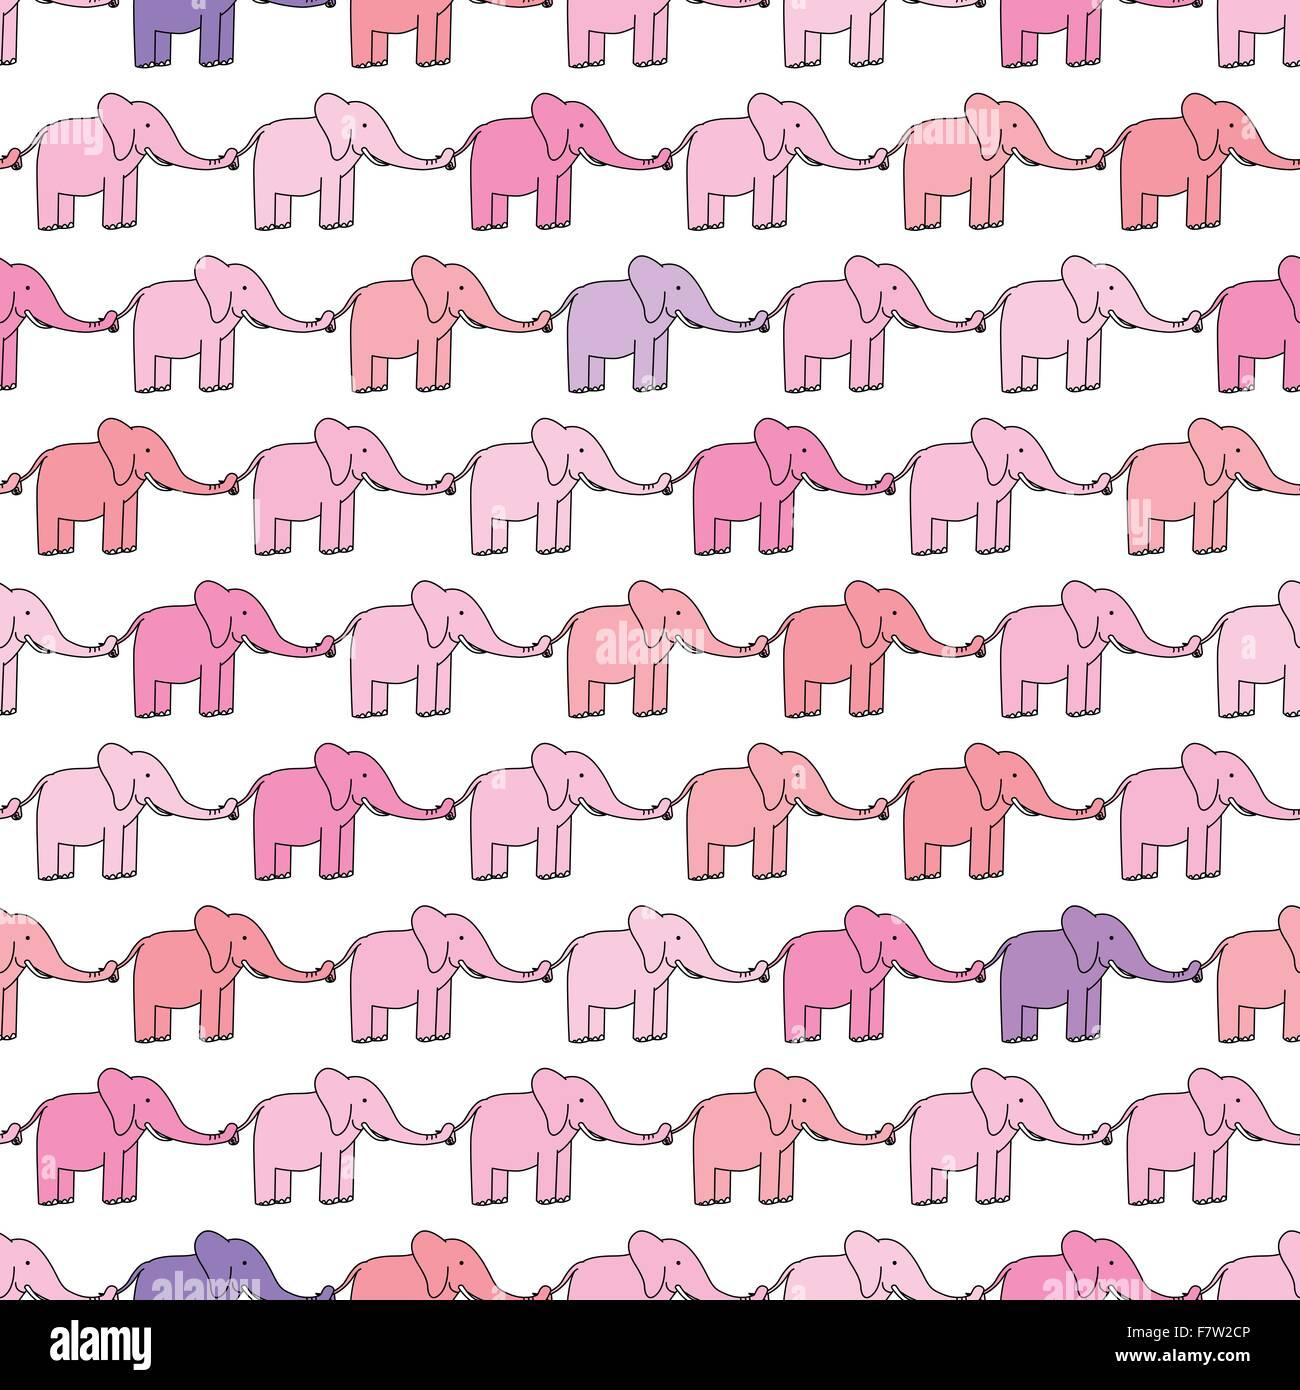 Happy elephants - Stock Image